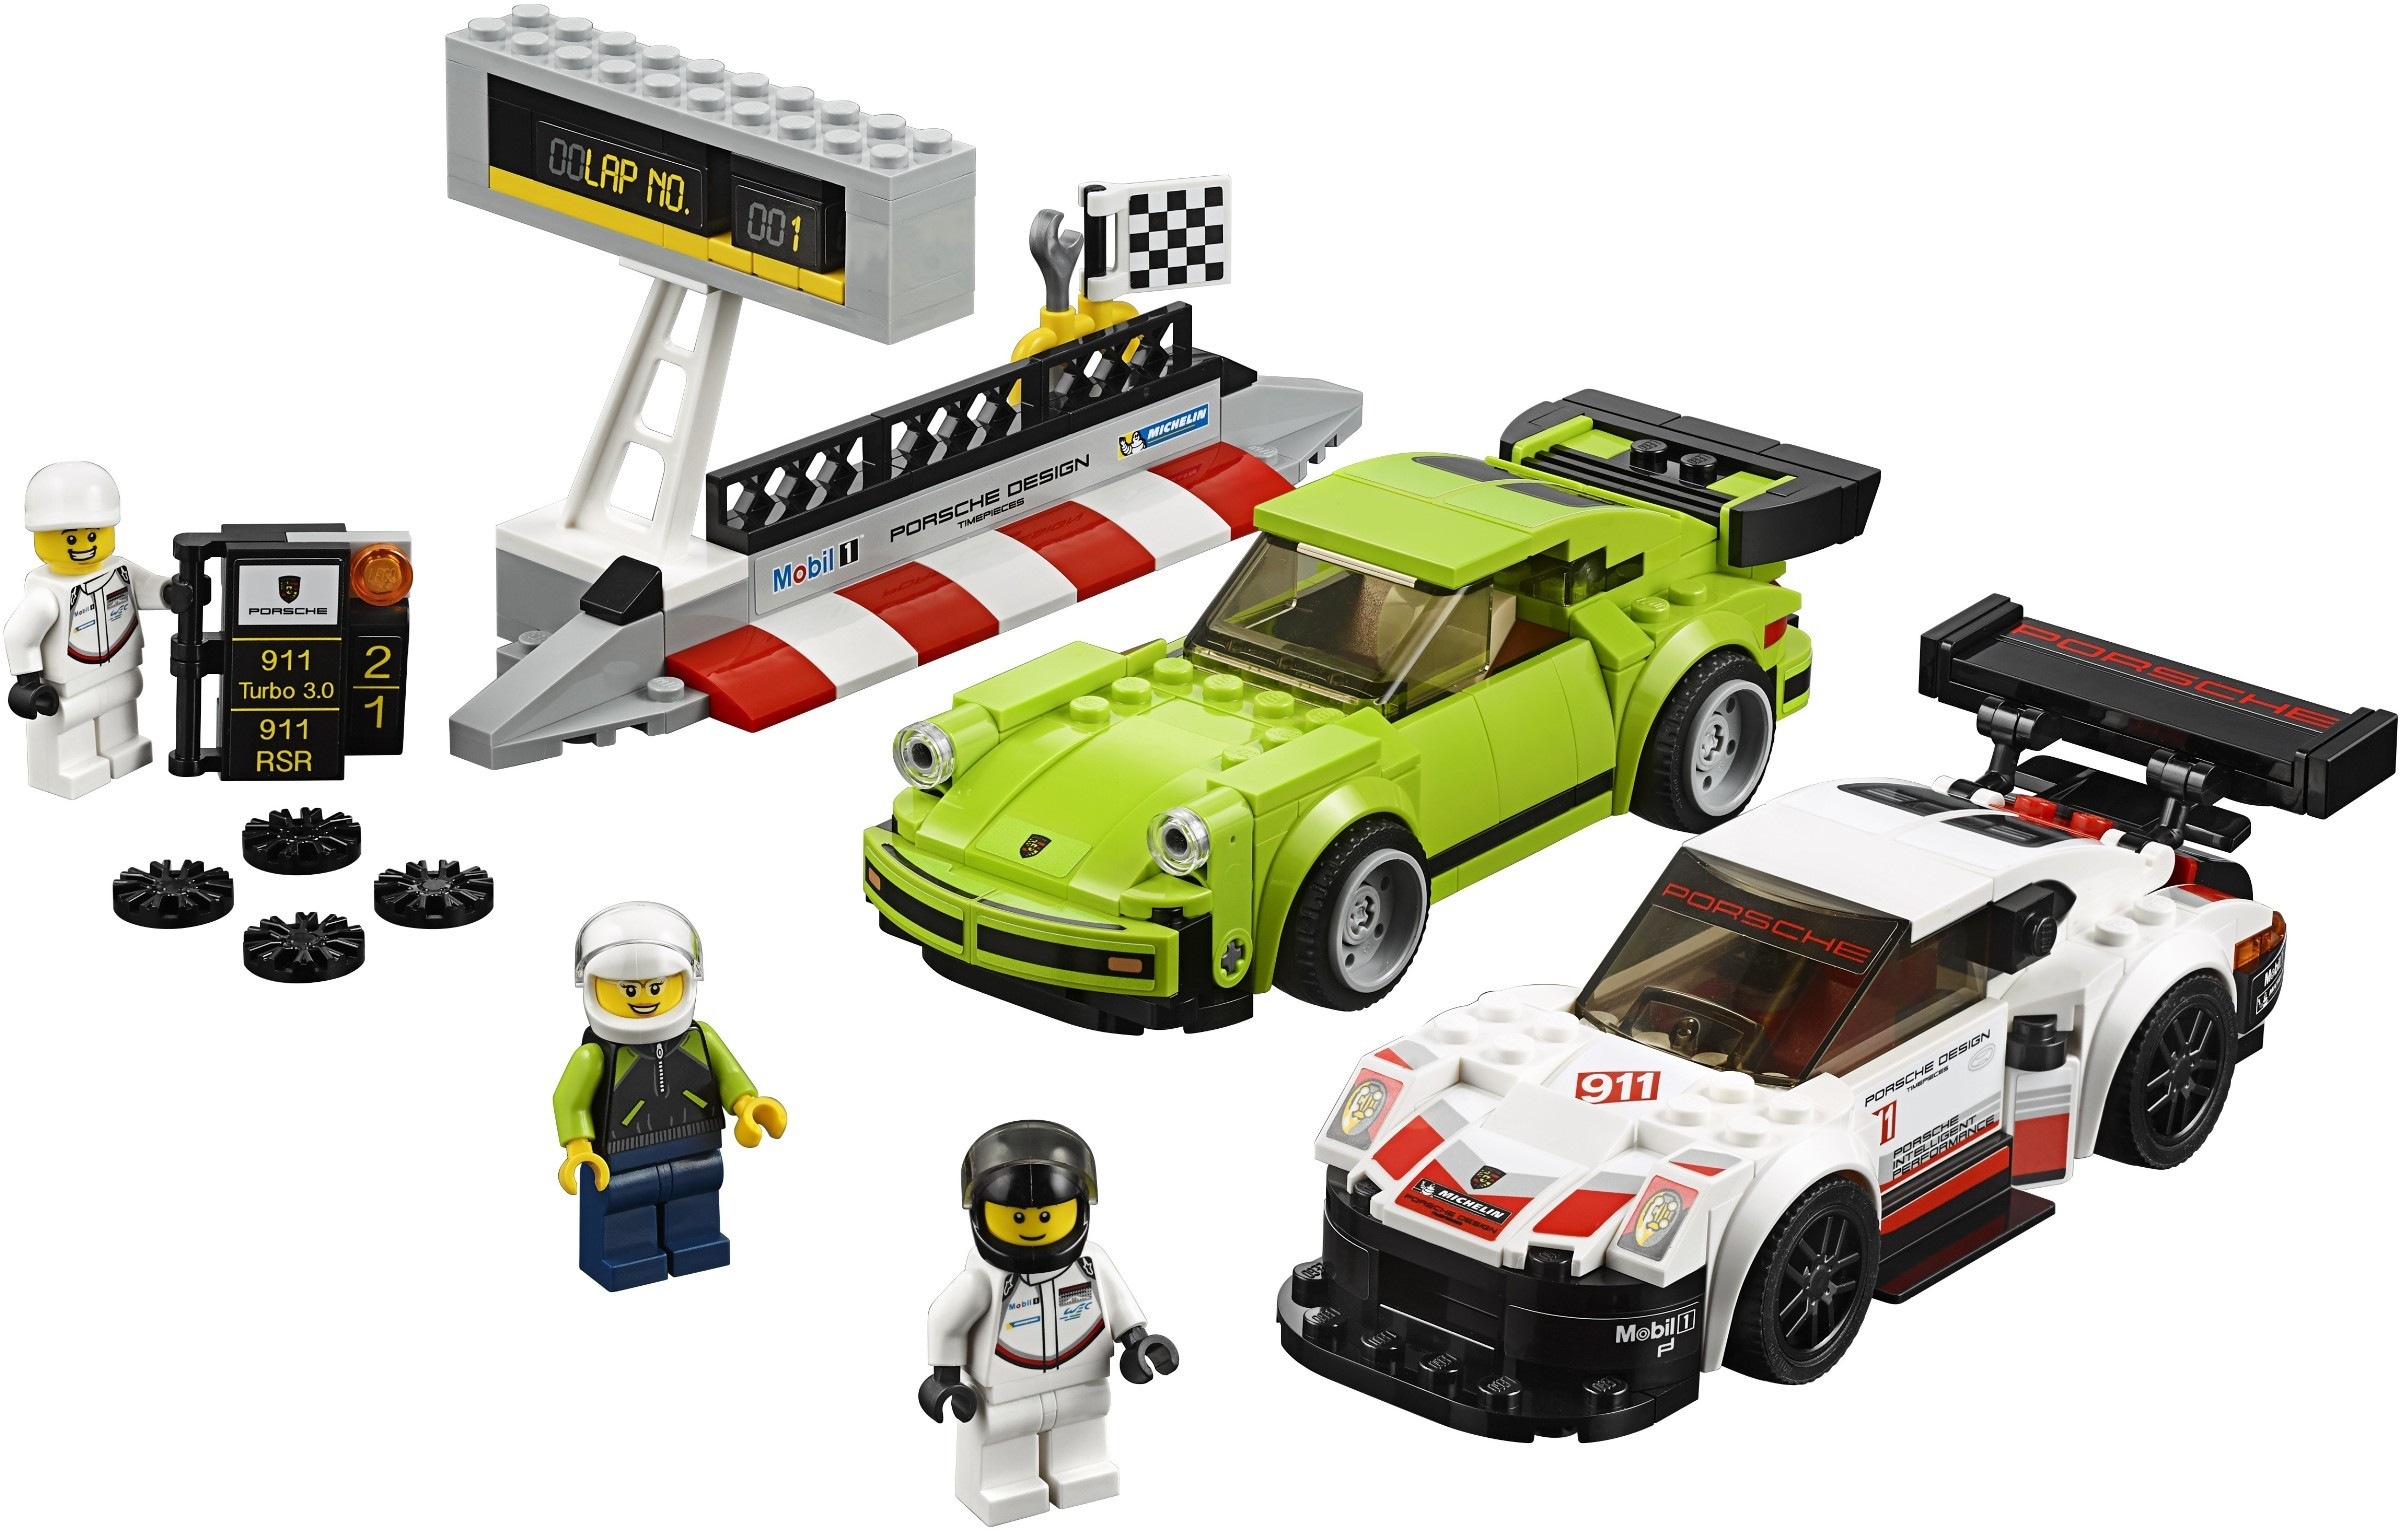 WANGE 2872 Super Racing Cars: Porsche 911 RSR and Porsche 911 Turbo 3.0 0